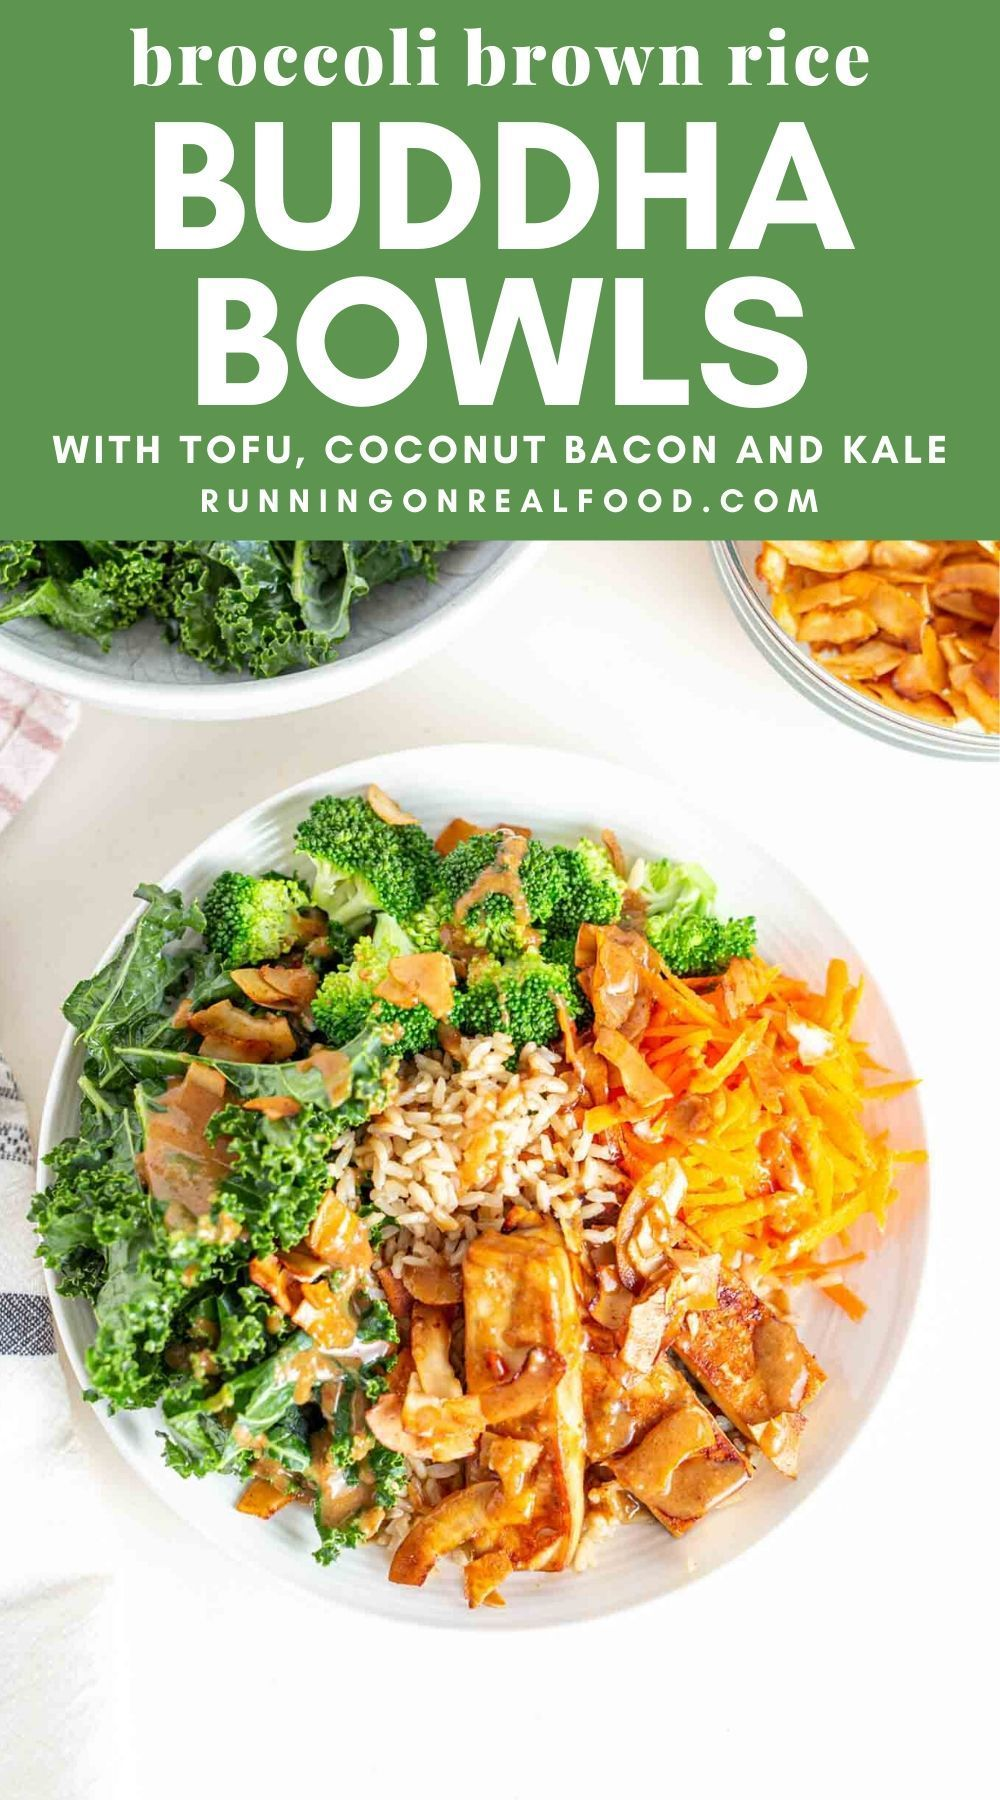 Broccoli Brown Rice Bowls Recipe In 2020 Delicious Tofu Healthy Vegan Dinner Recipes Vegetarian Recipes